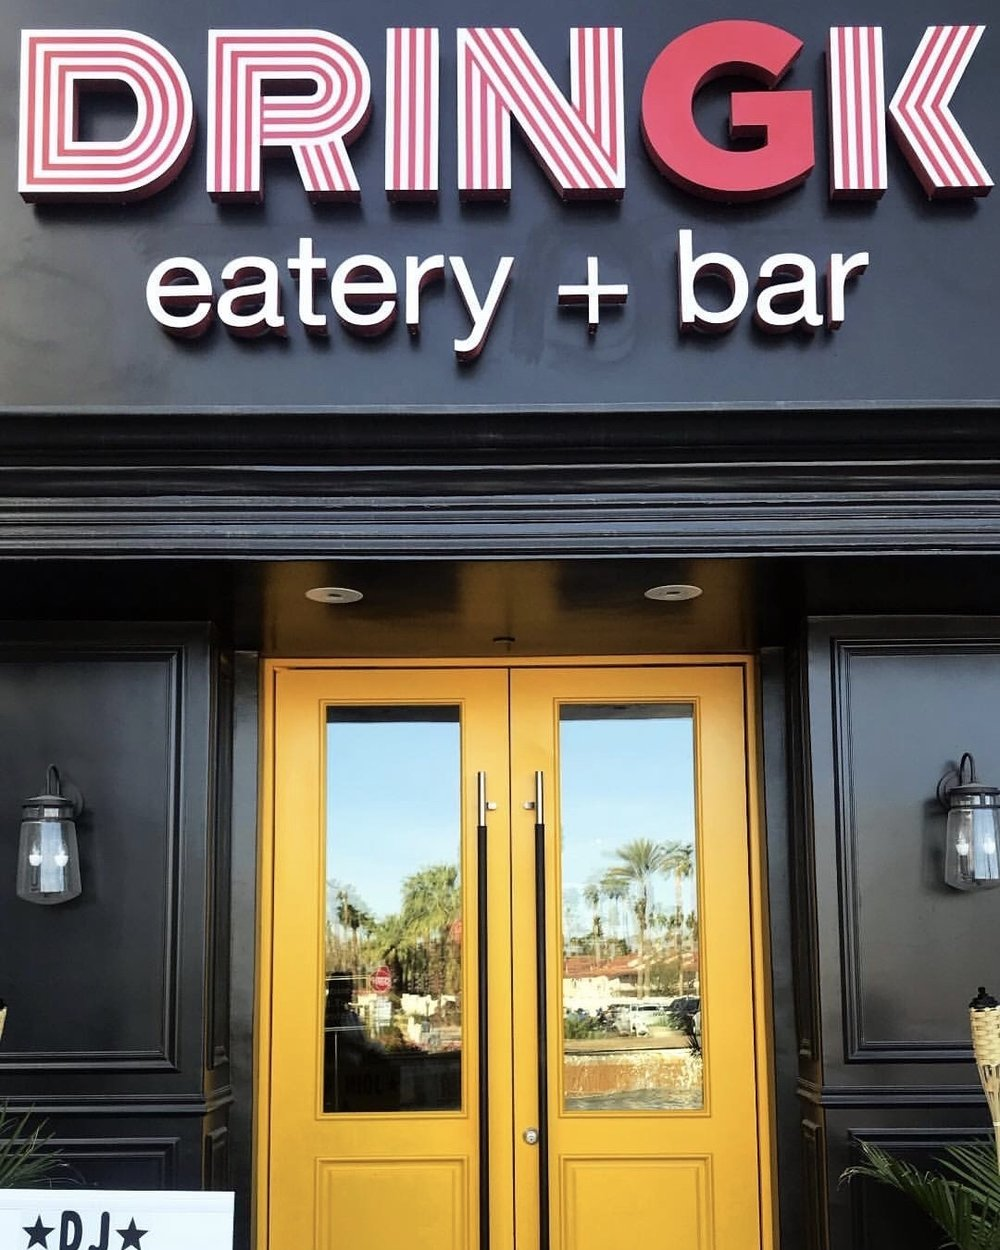 Dringk Eatery and Bar.jpg